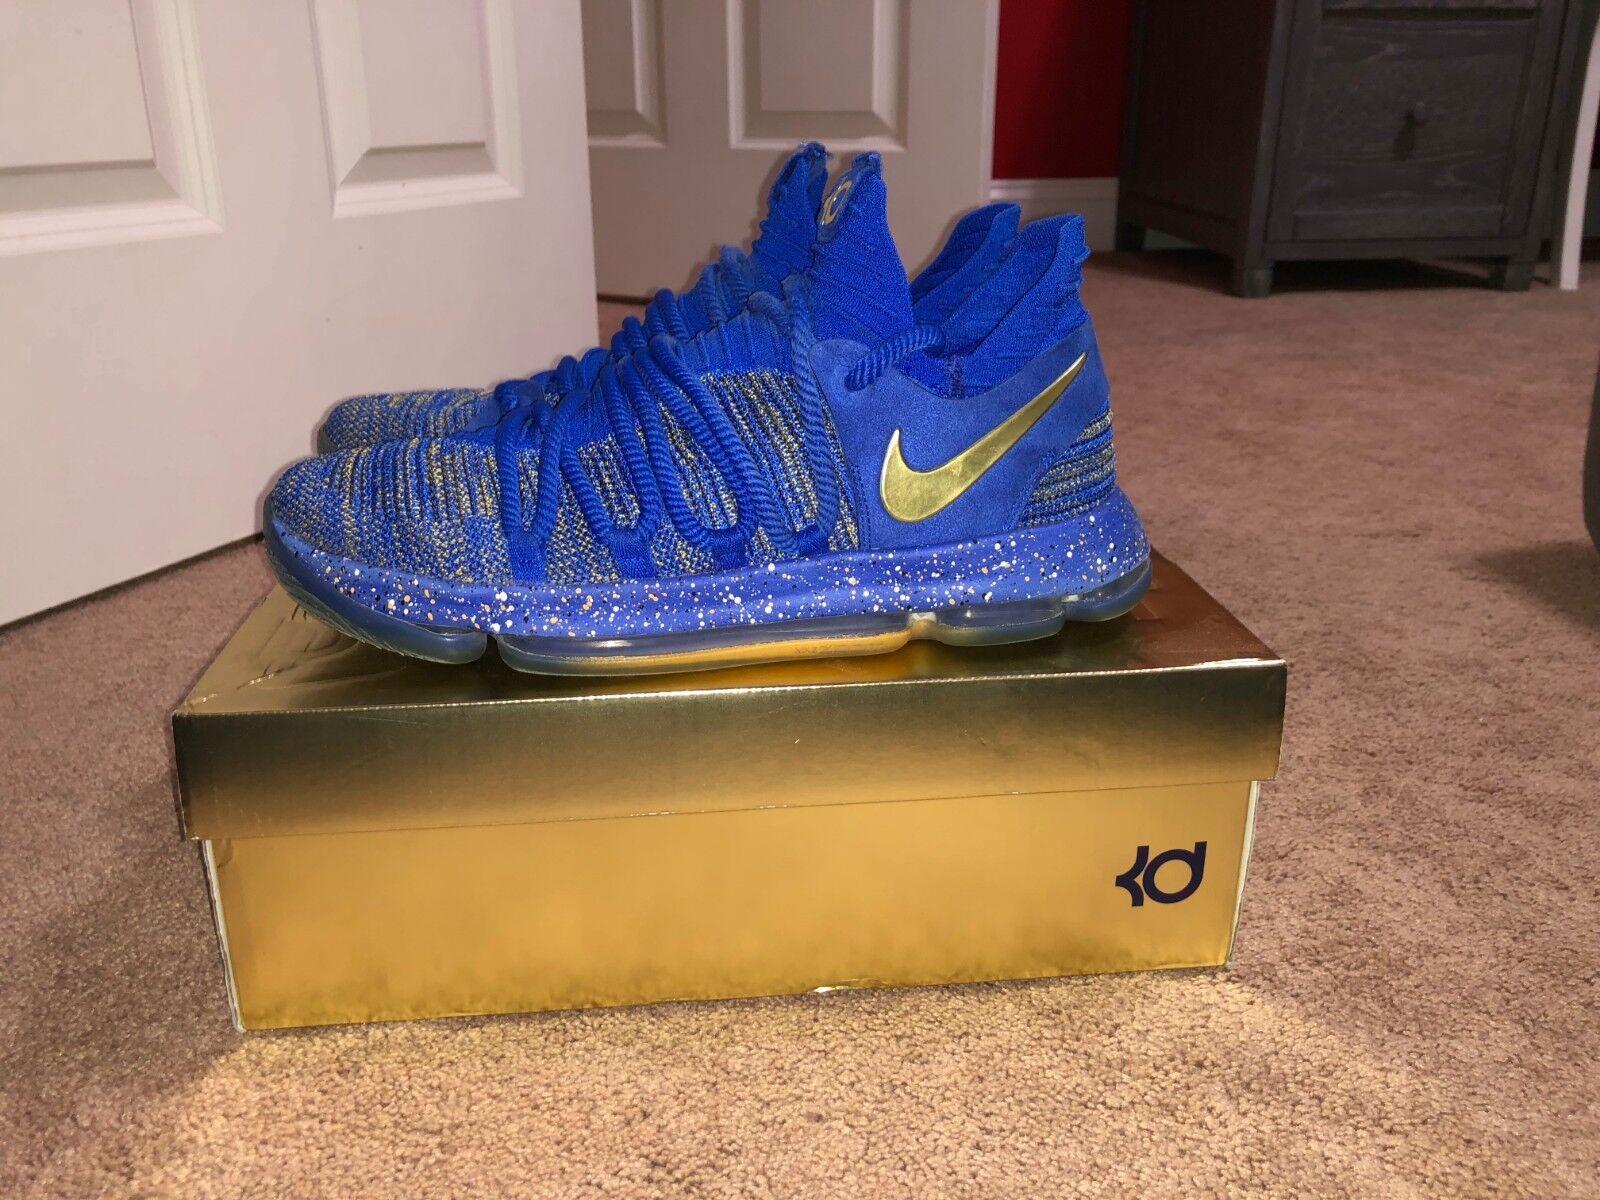 Nike KD 10 X Finals MVP golden State Warriors Size 11 Jordan kobe Yeezy